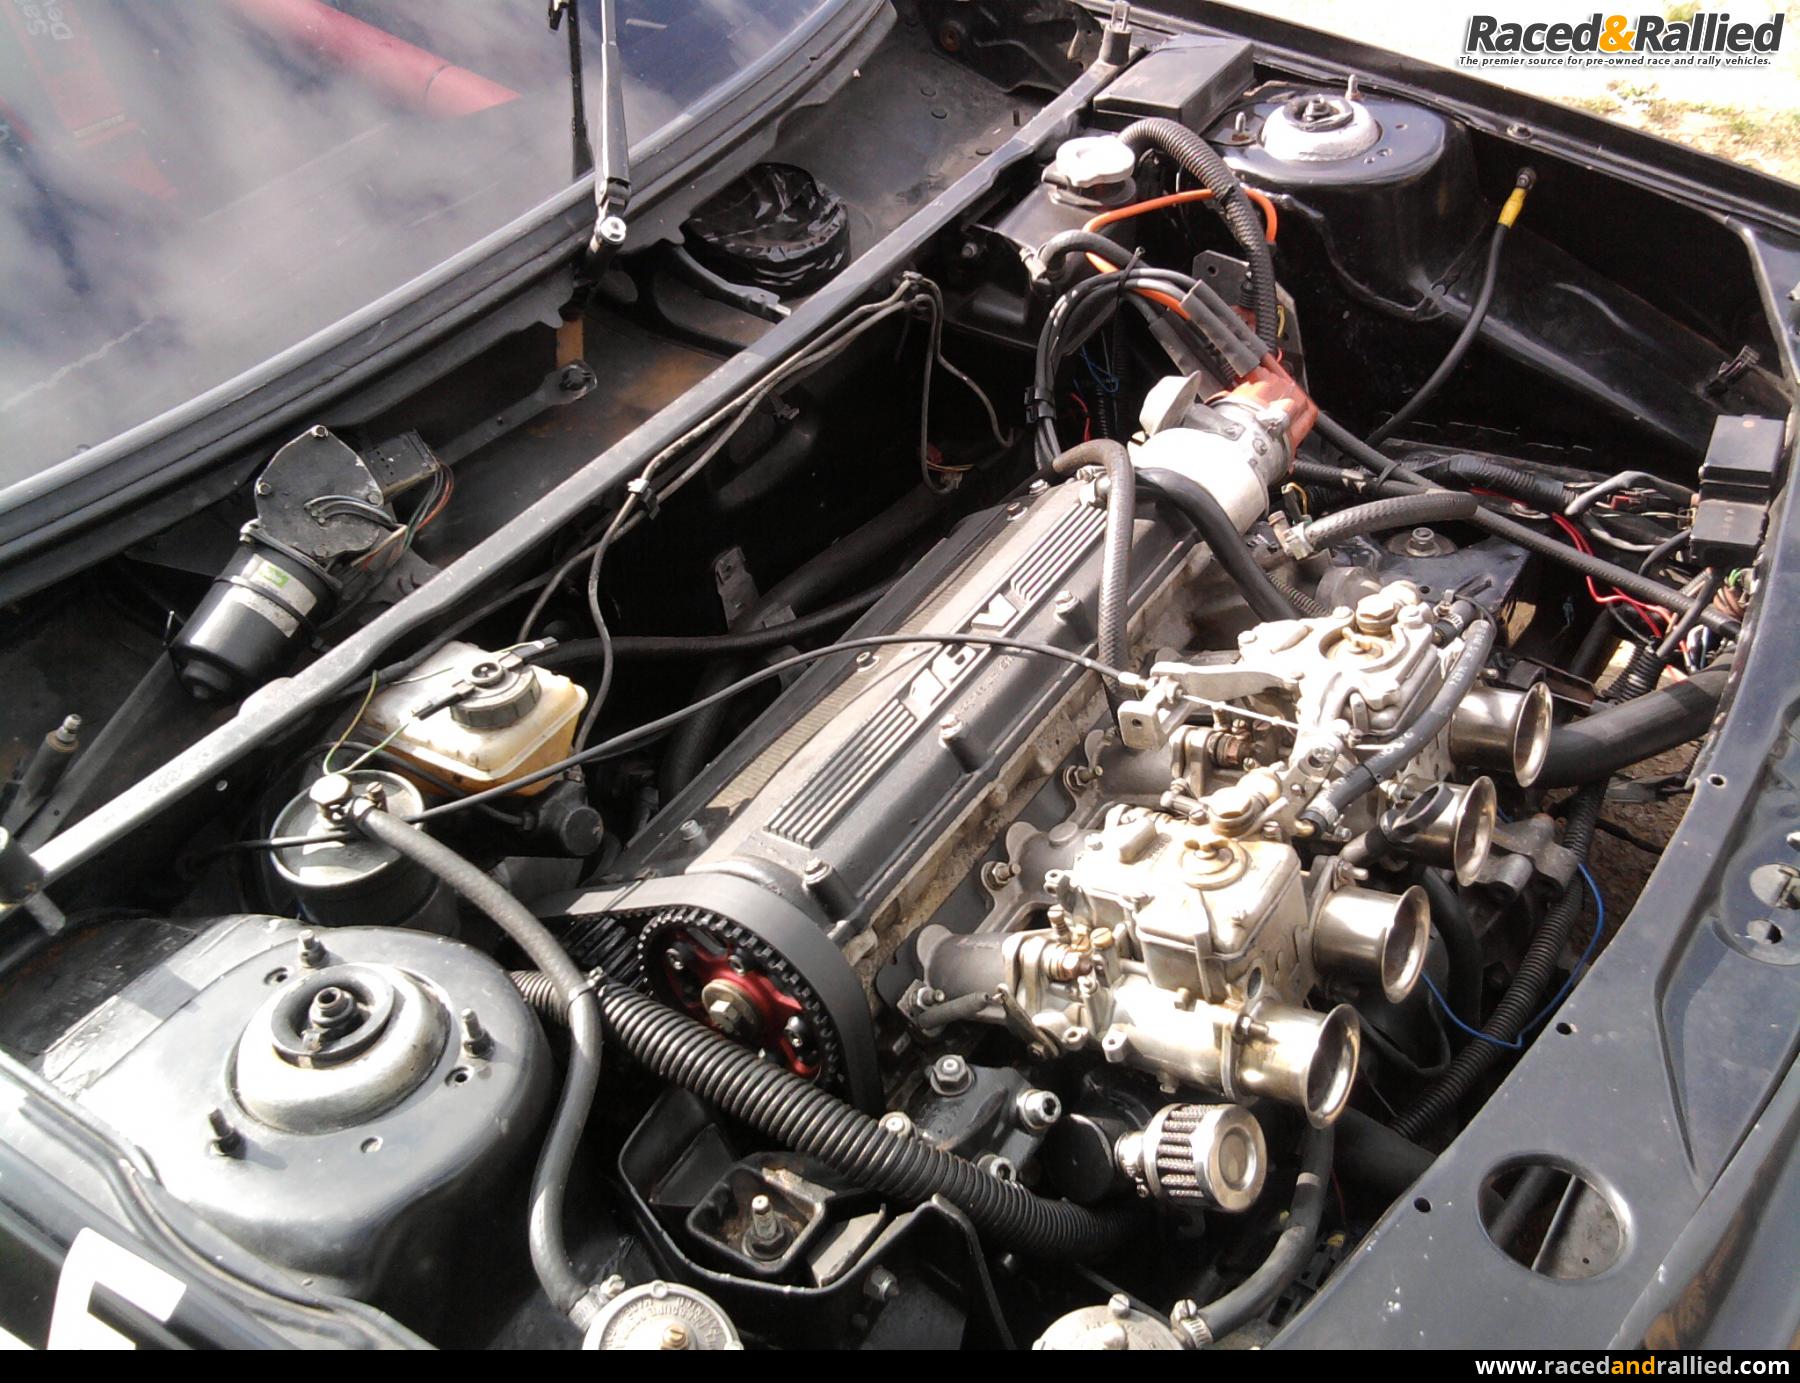 peugeot 205 mi16 hillcimb trackcar 240bhp/700kgs | race cars for